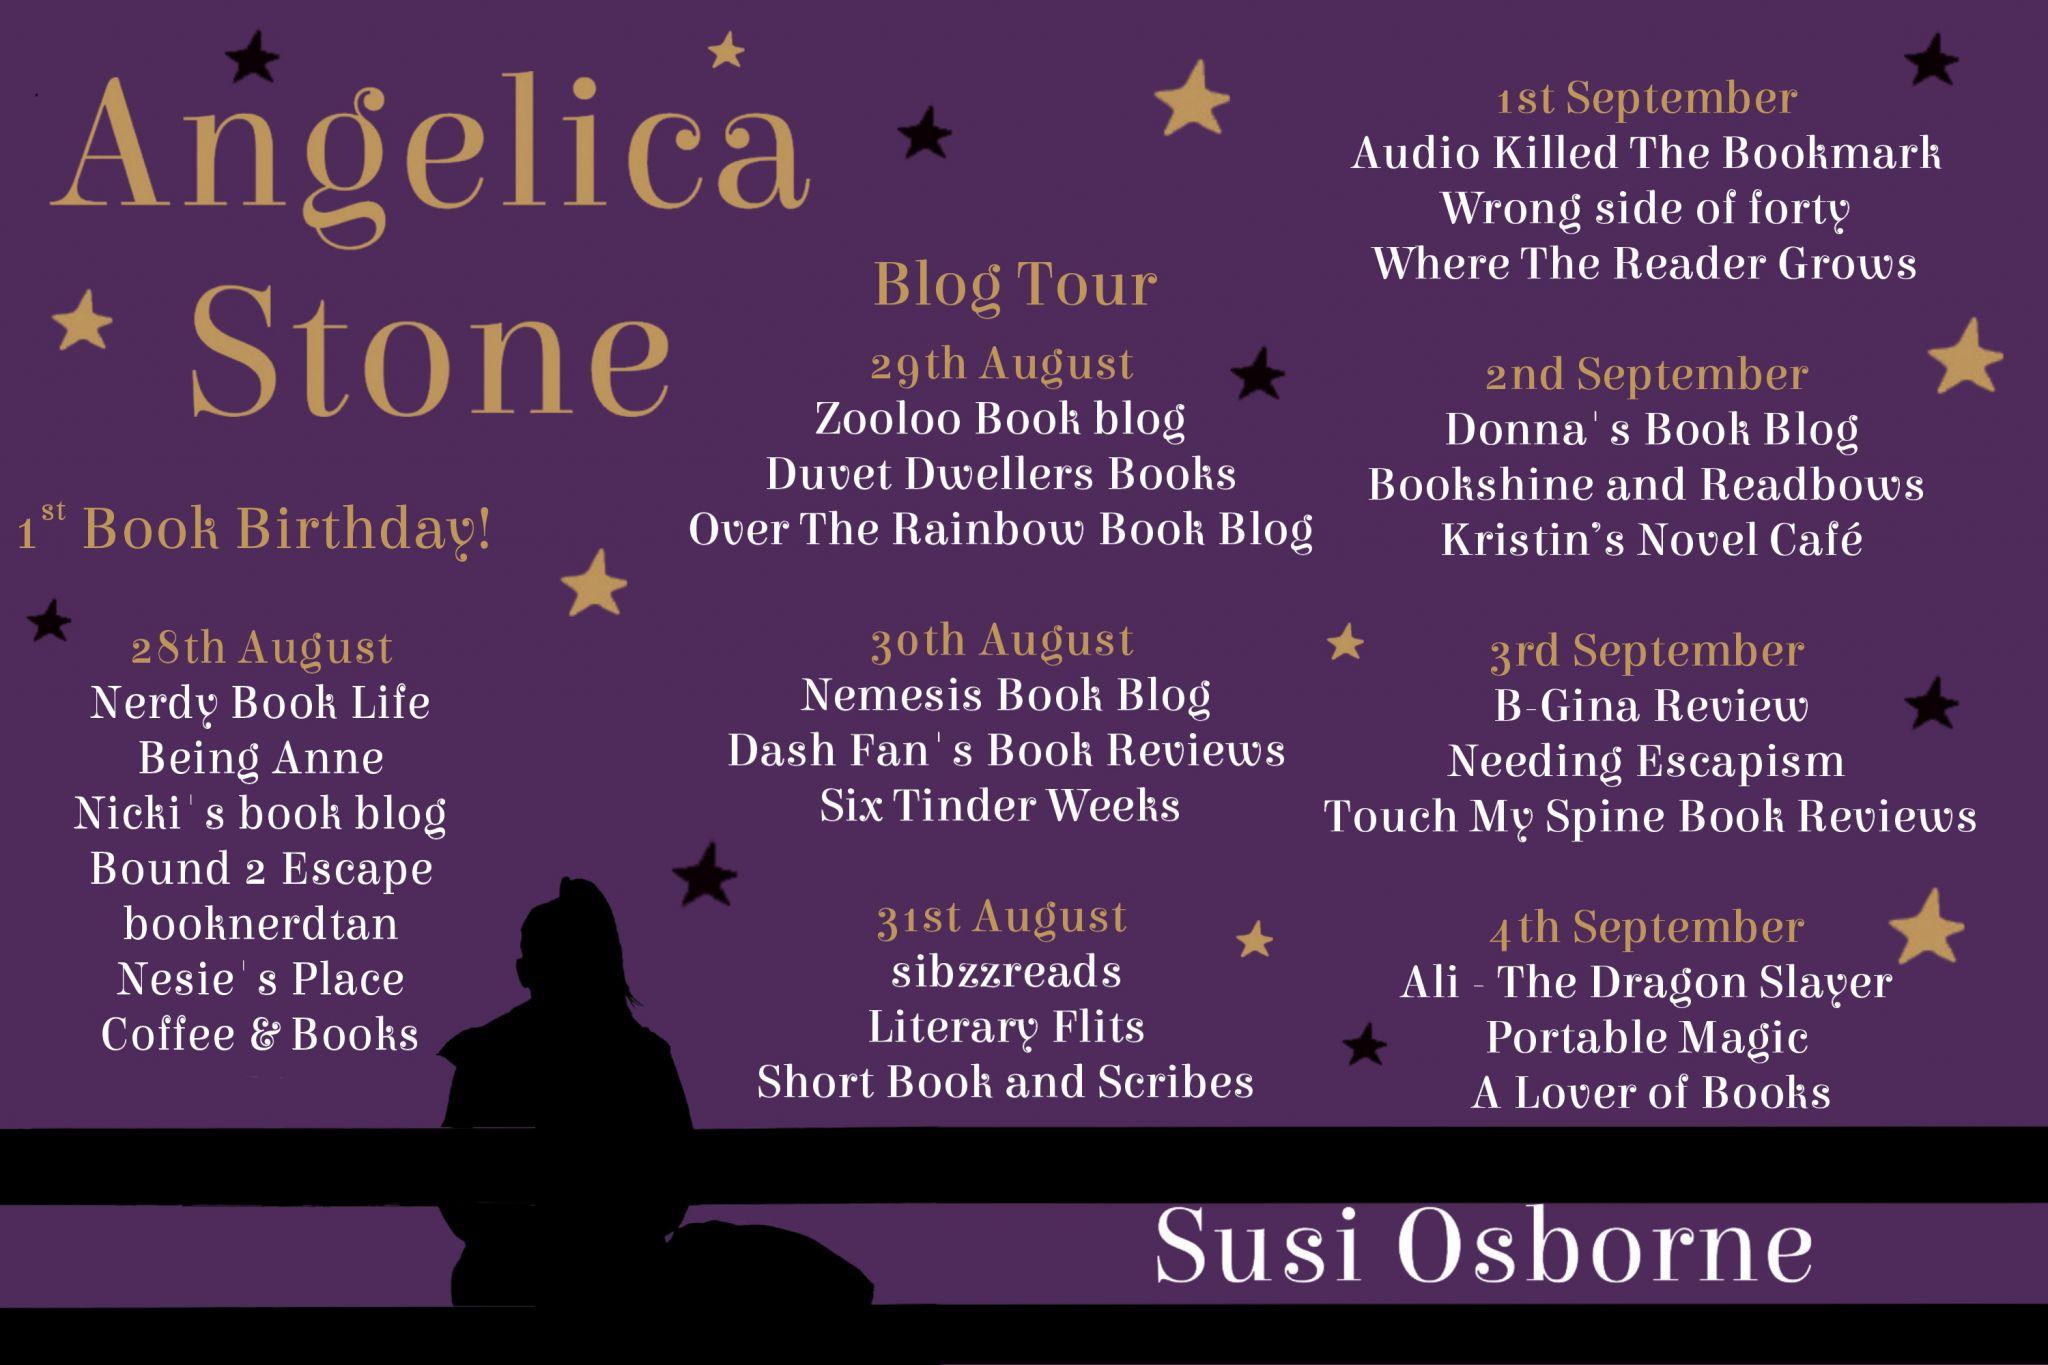 #BookReview of Angelica Stone by Susi Osborne @susiosborne @rararesources